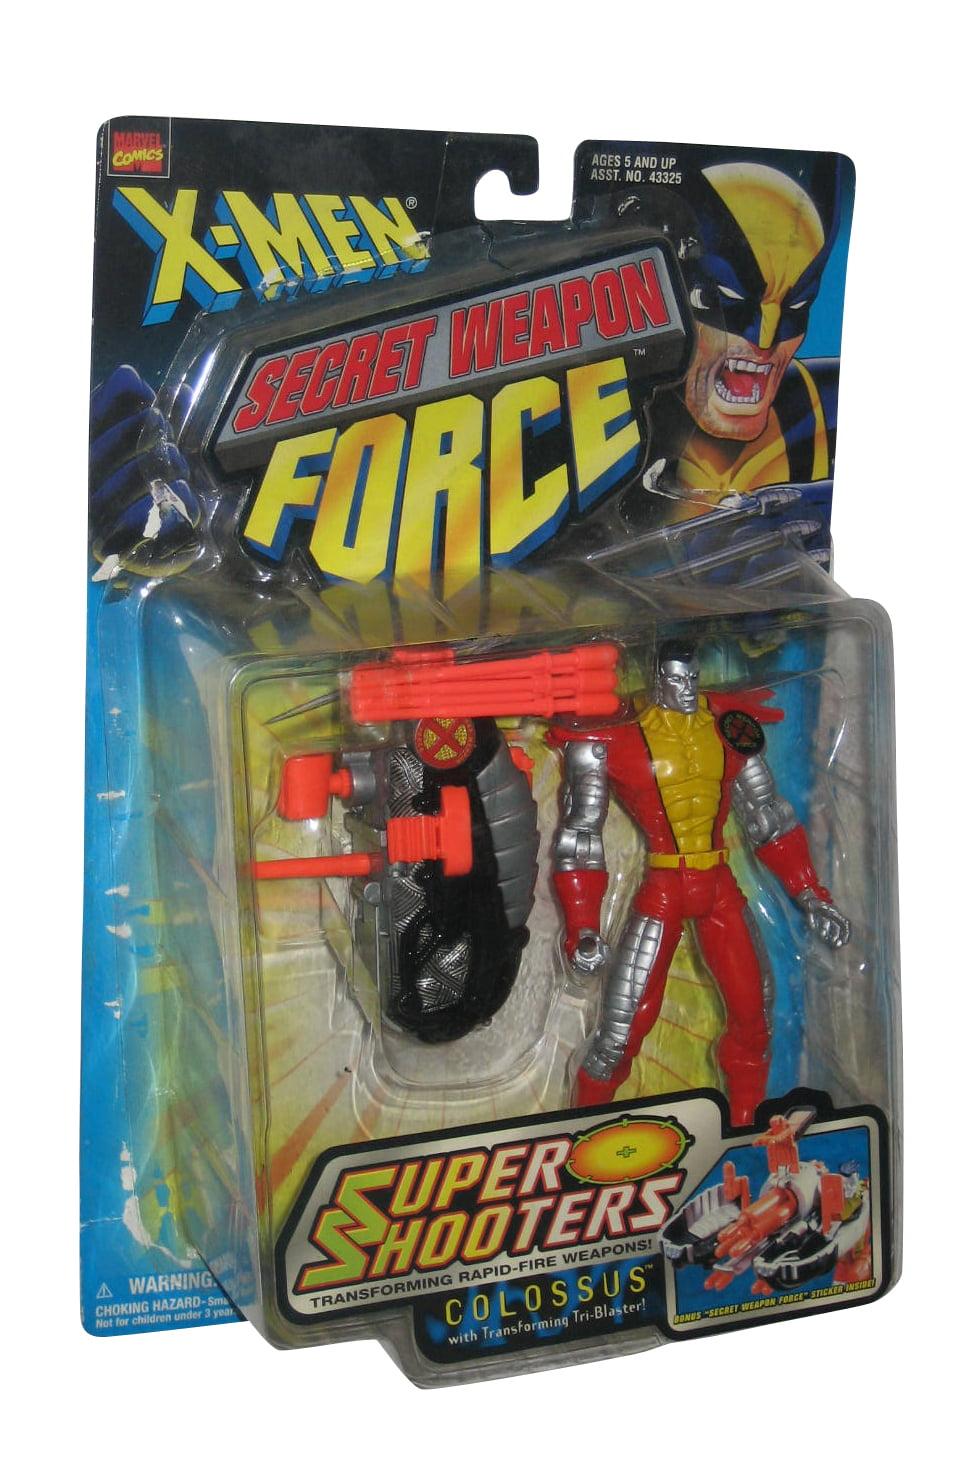 Marvel X-Men Secret Weapon Force Colossus Super Shooters Toy Biz Figure by Toy Biz